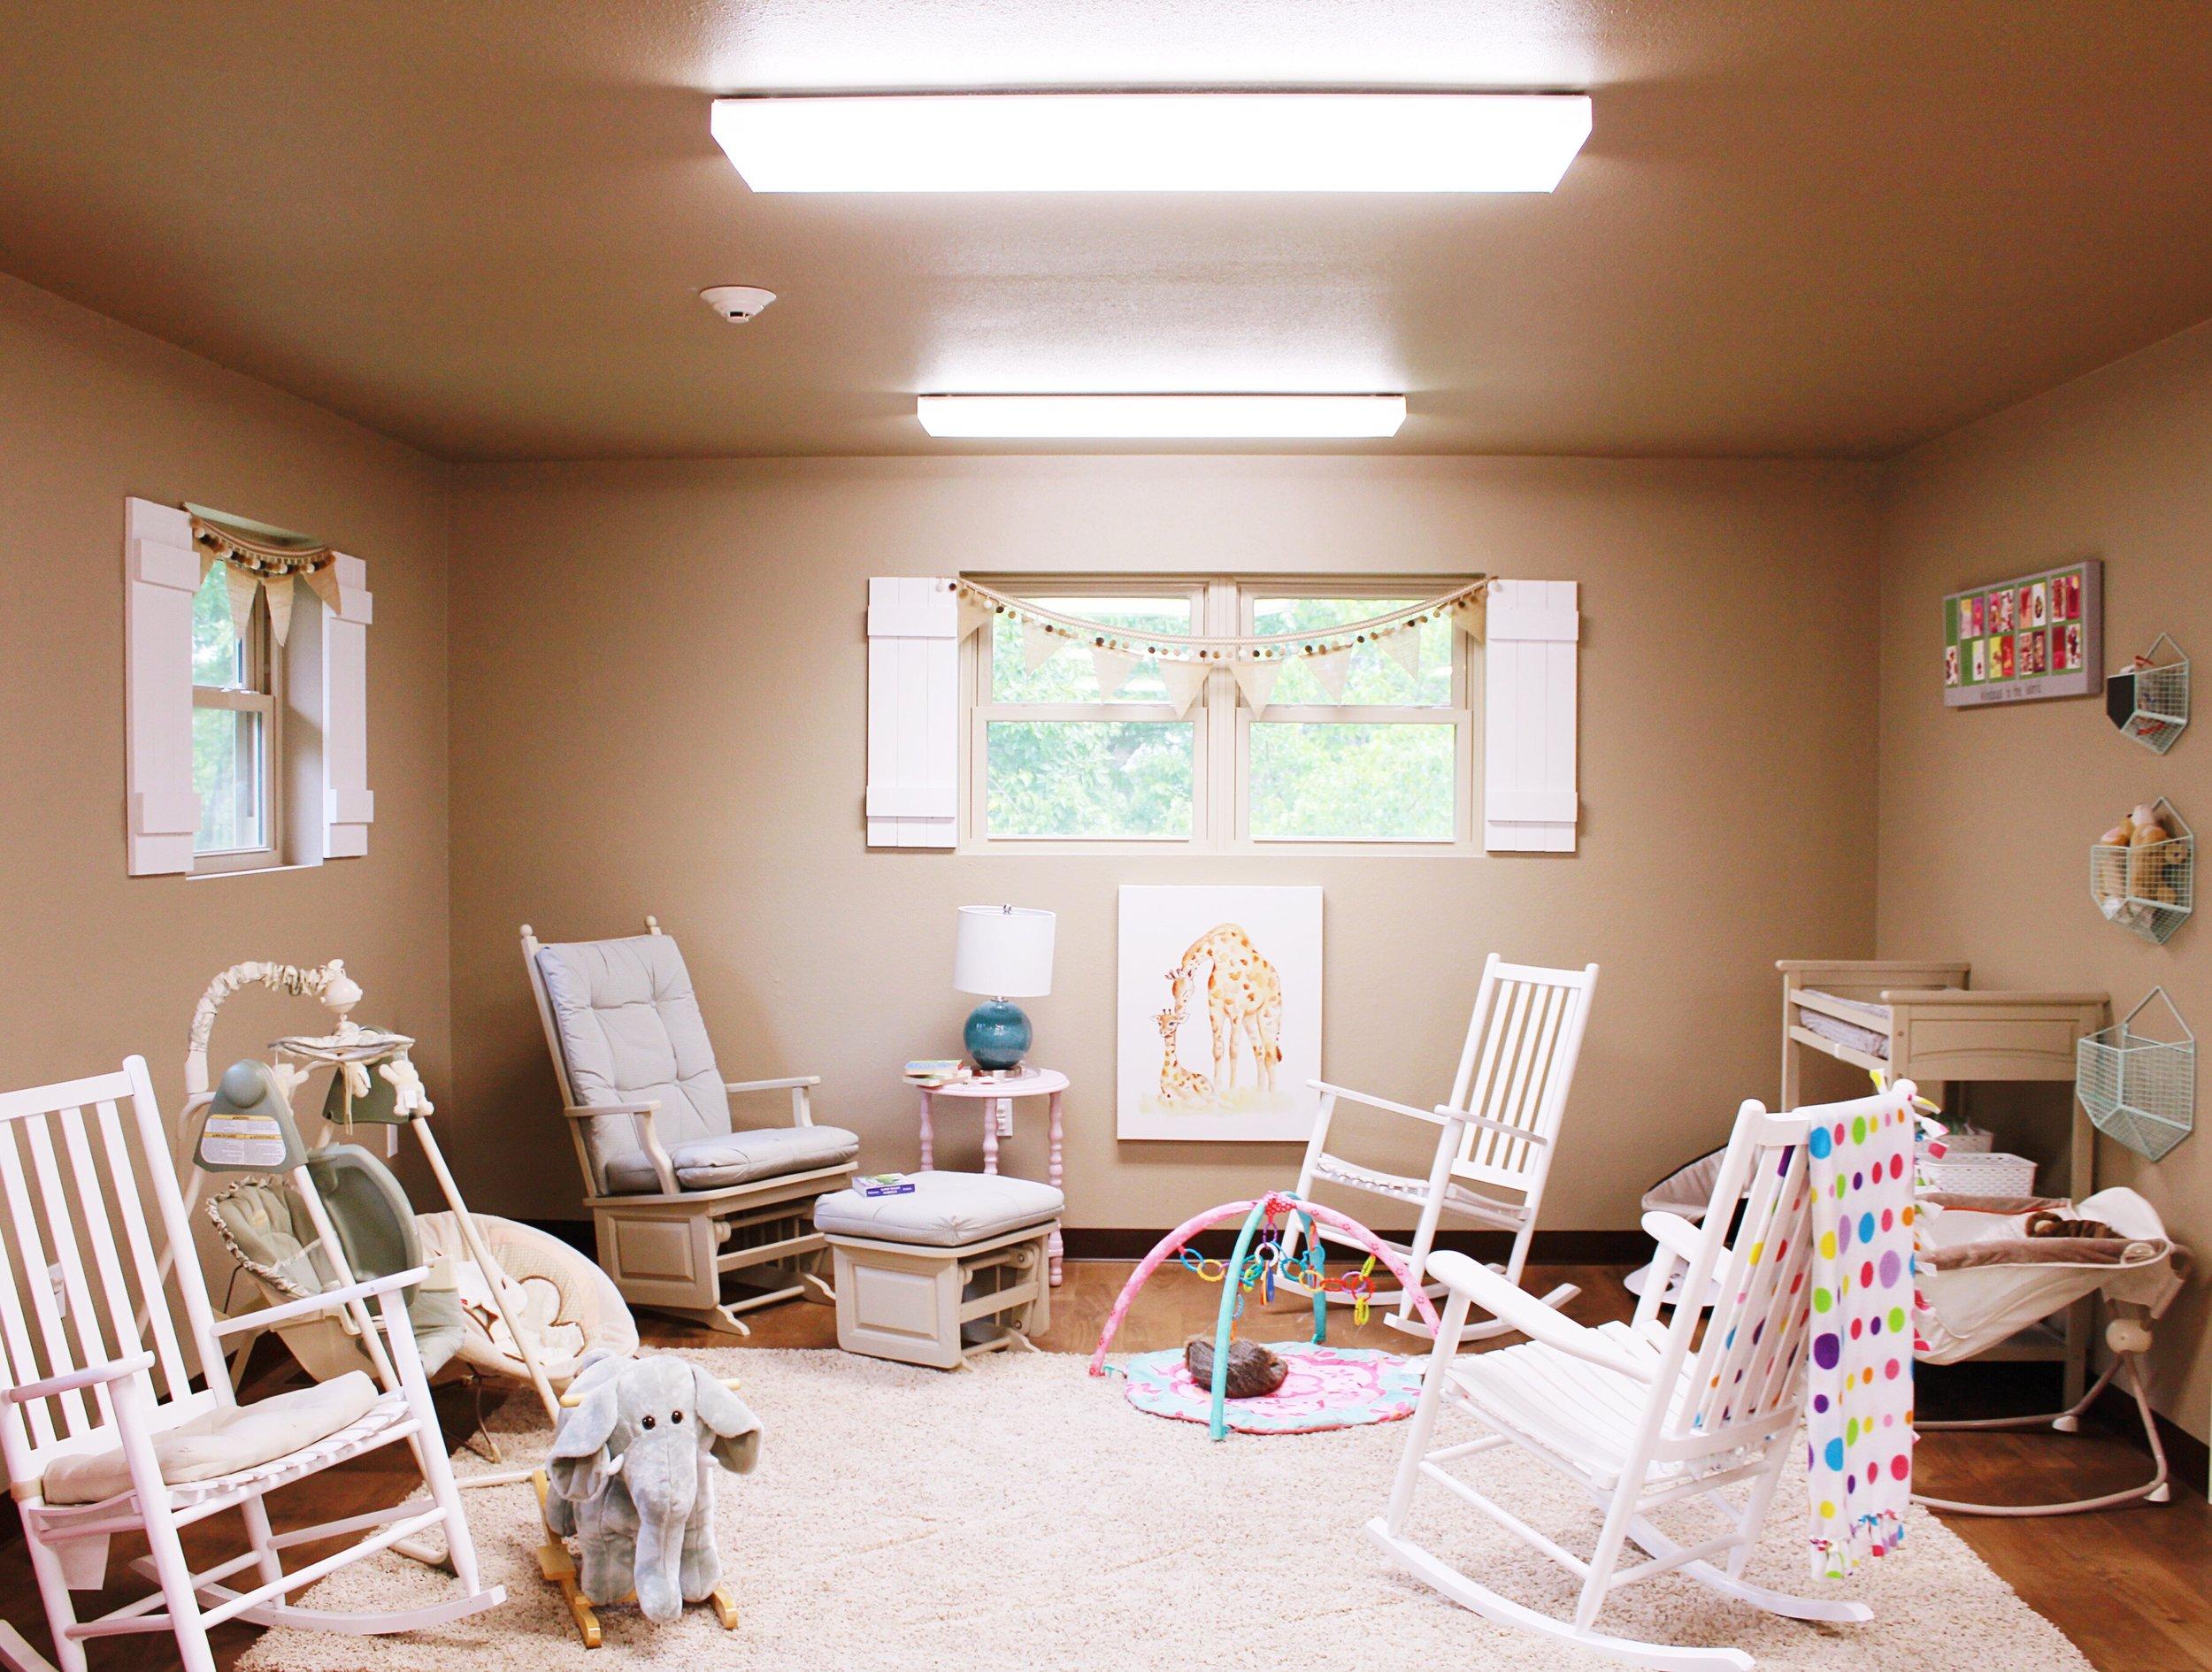 halo-house-baby-room-jefferson-city-mo-jeff-city-blog-home-for-homeless-teenage-girls